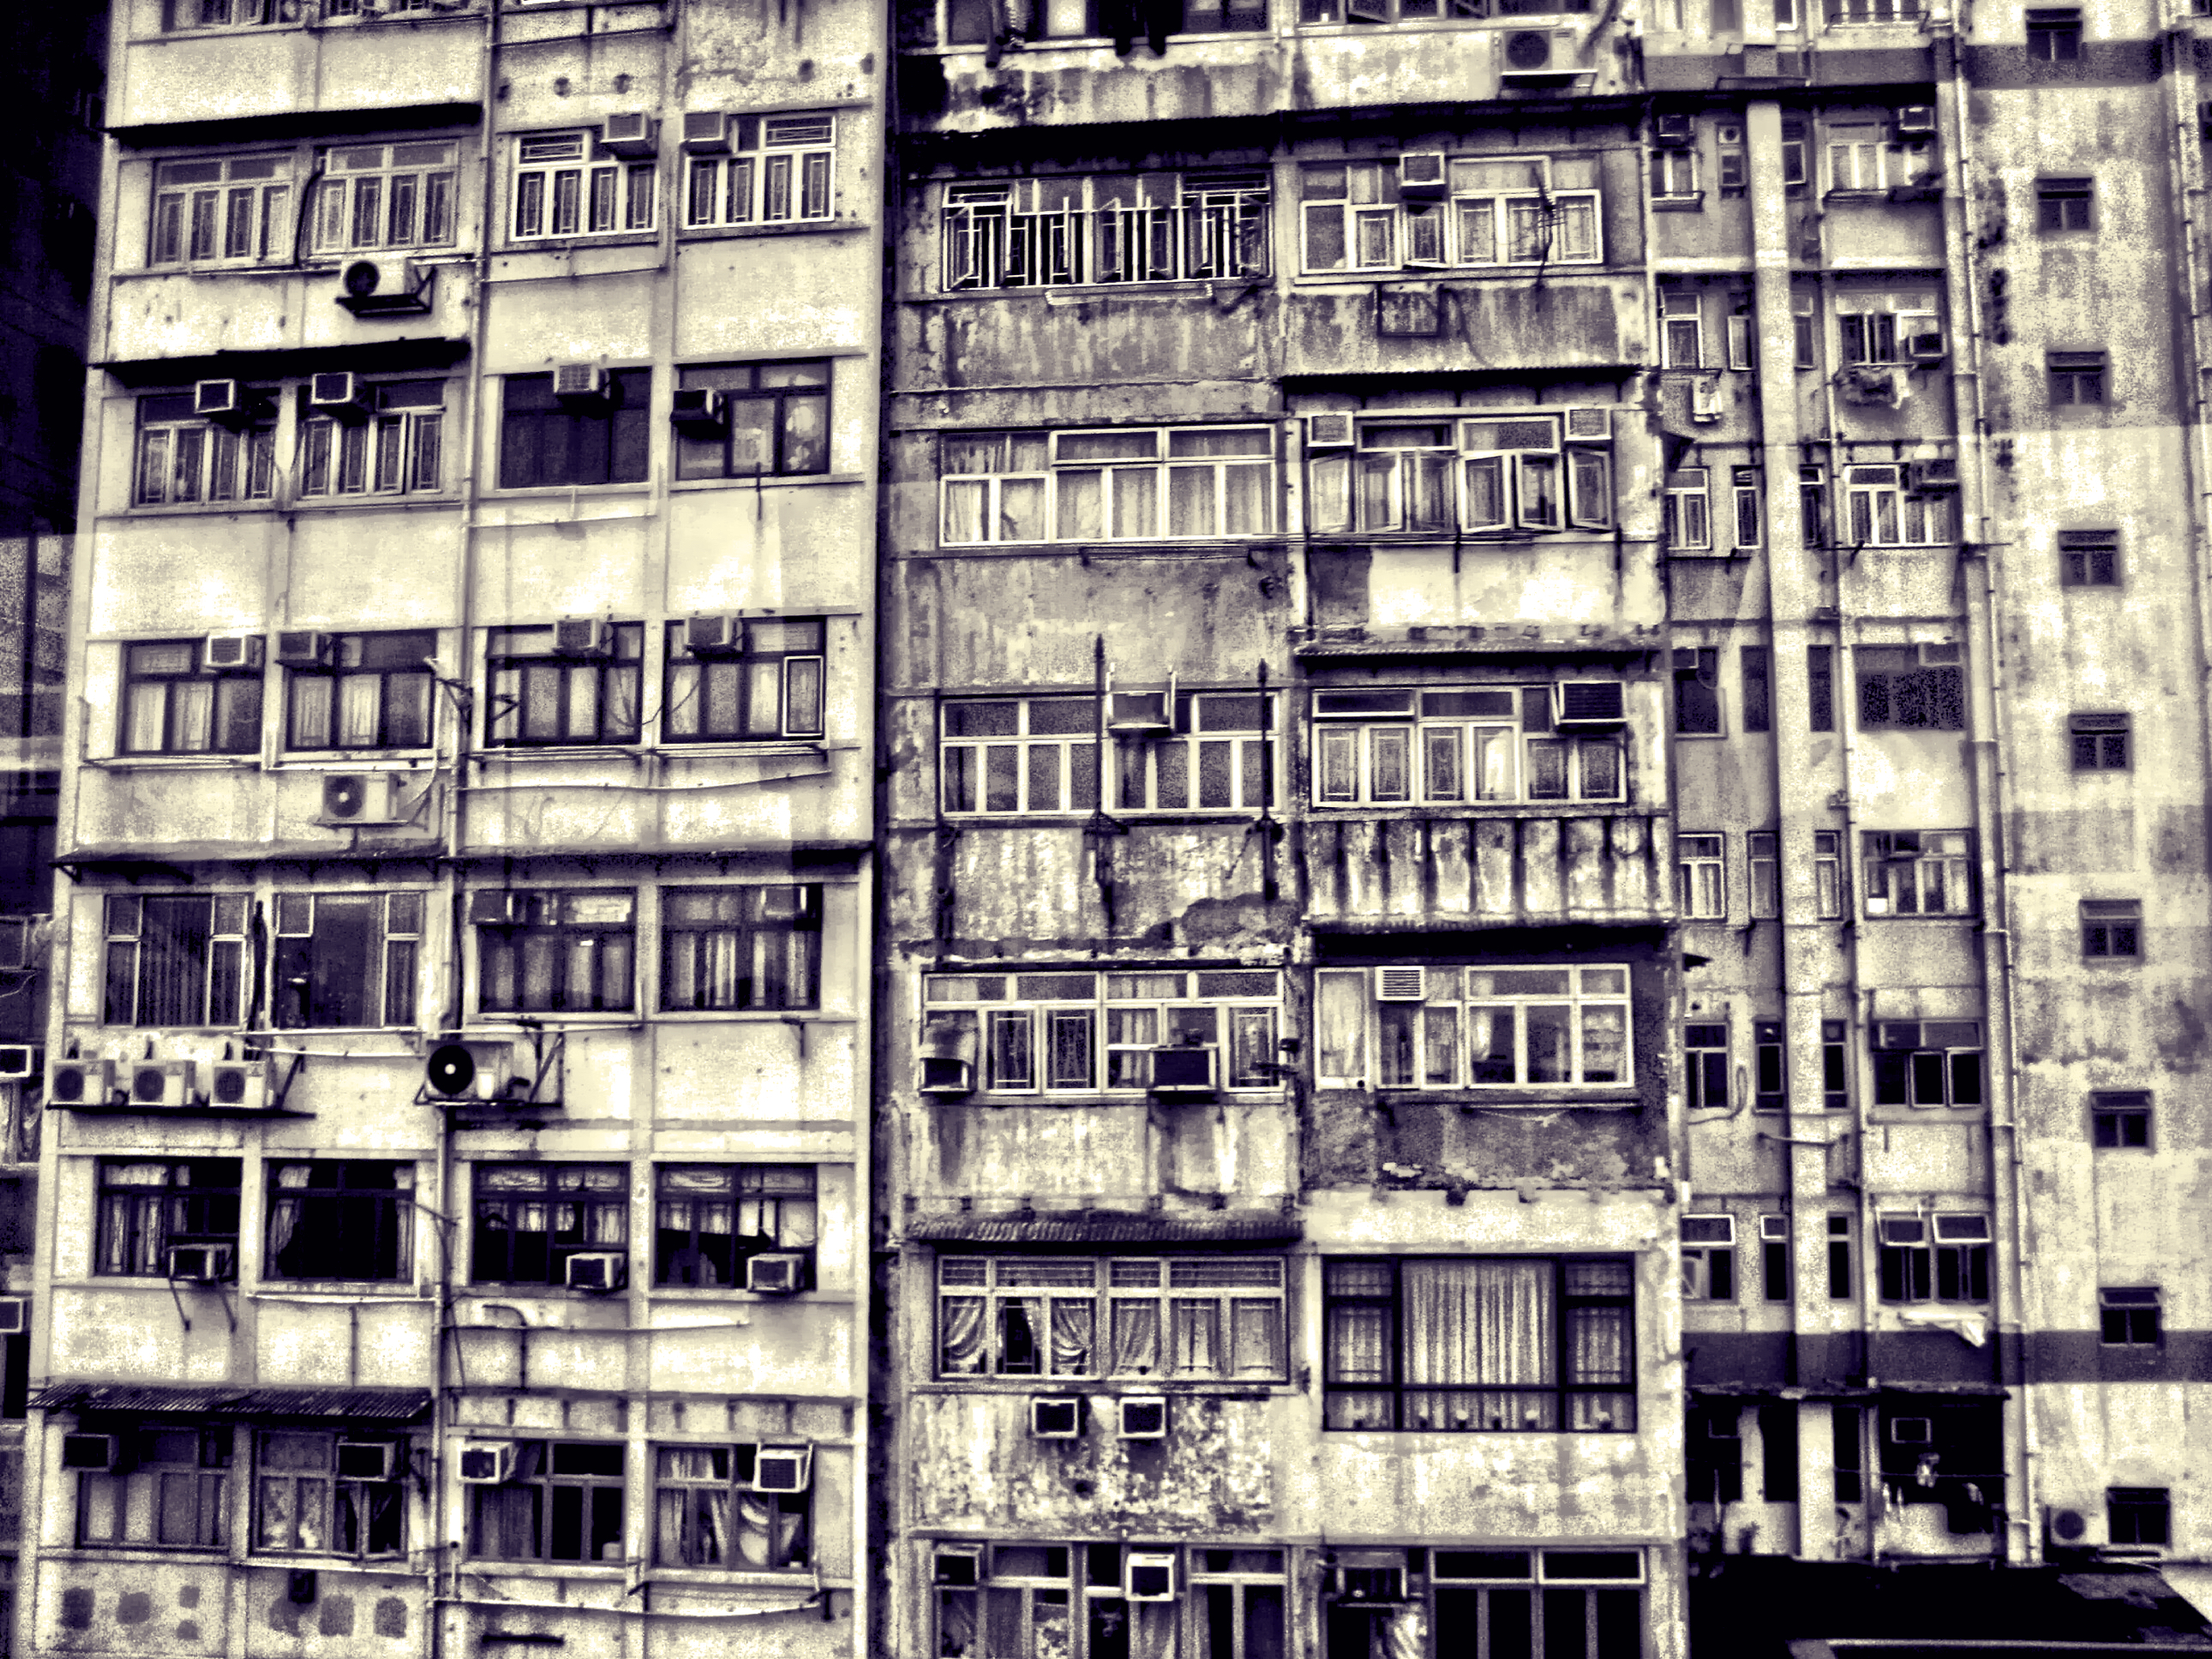 HONGKONG 08:06